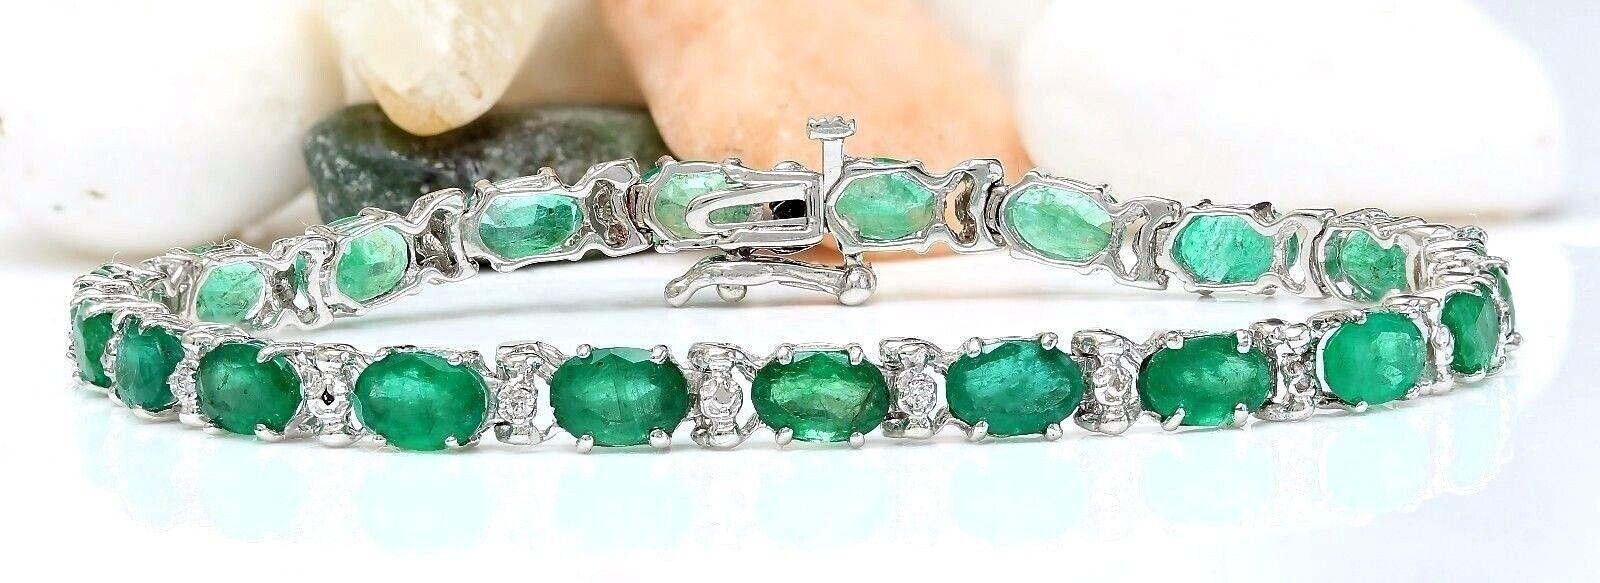 12.20 Carat Natural Emerald 14K Solid White Gold Diamond Bracelet